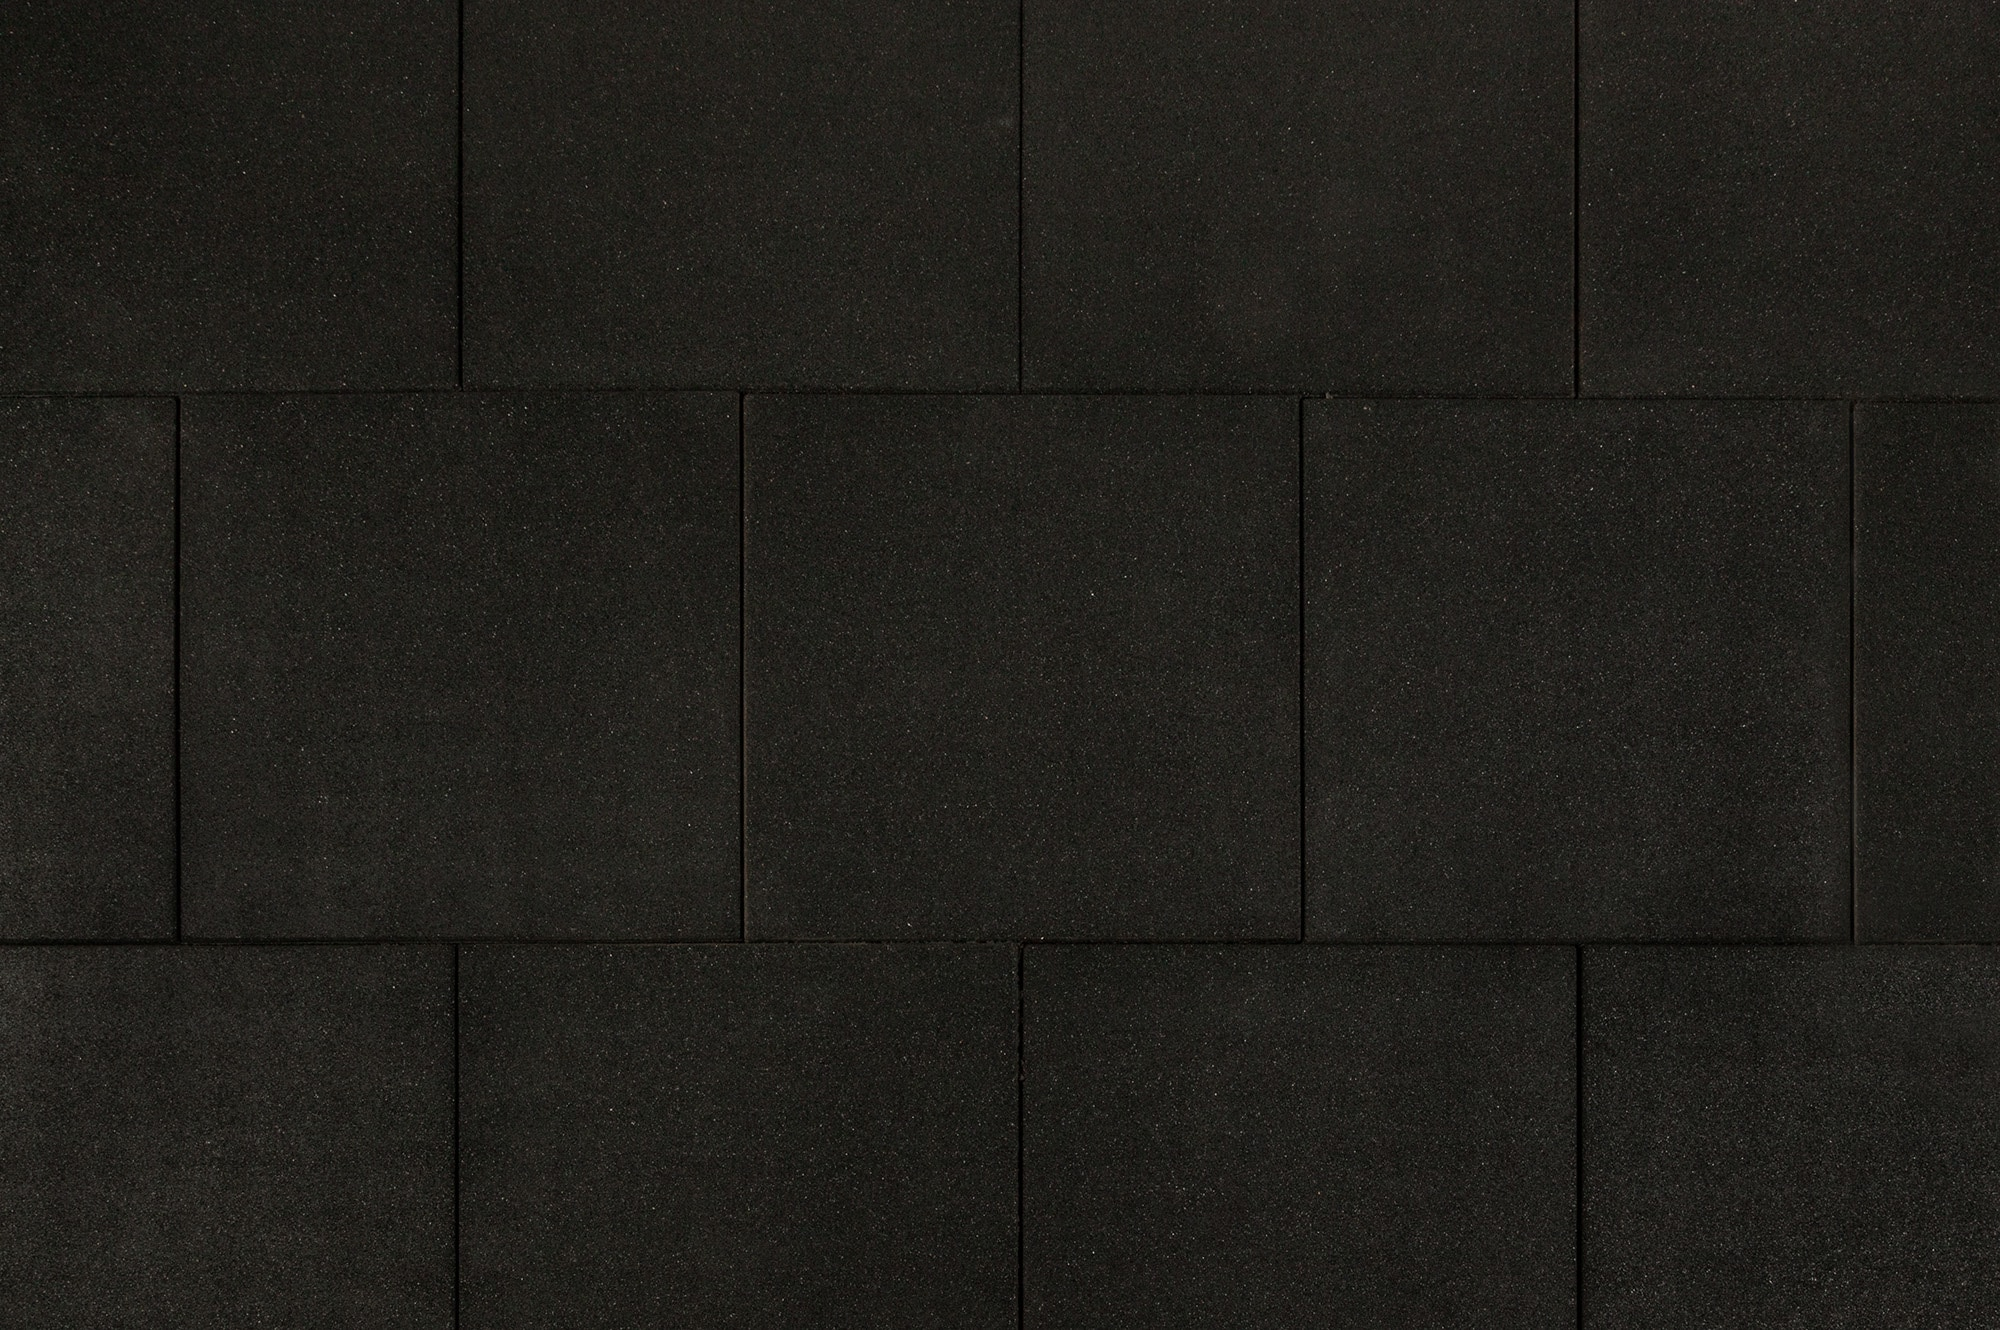 Free samples brava outdoor prestige rubber tiles 24x24x1 34 free samples brava outdoor prestige rubber tiles 24x24x1 34 rubber black doublecrazyfo Image collections